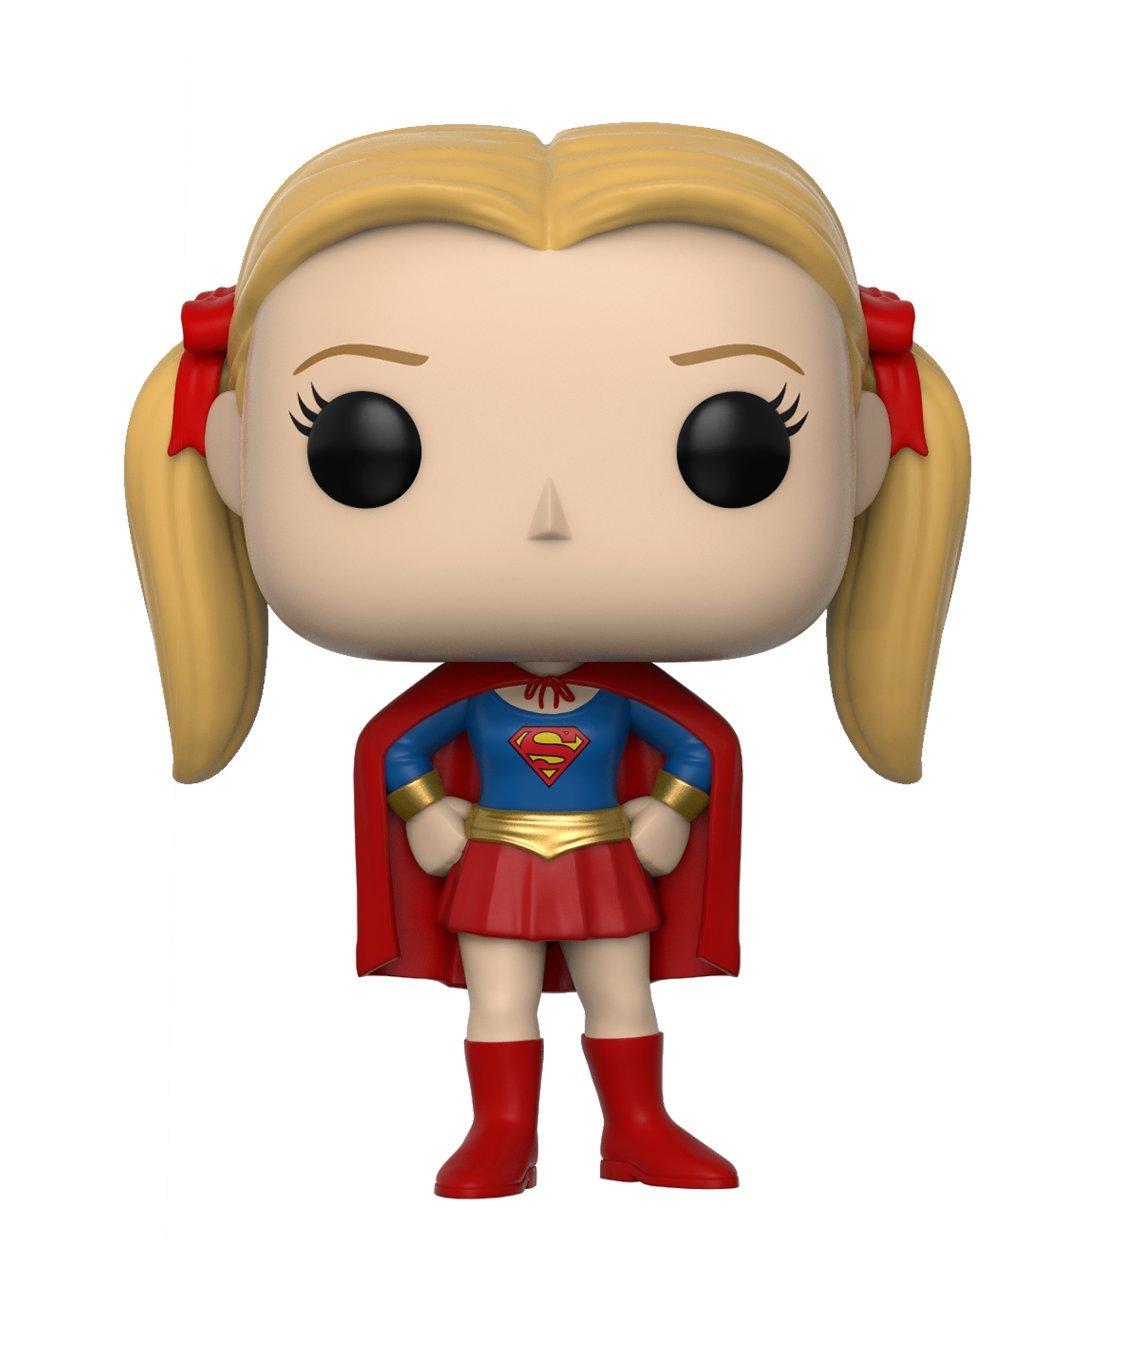 ویکالا · خرید  اصل اورجینال · خرید از آمازون · Funko Pop Television: Friends - Superhero Pheobe Collectible Figure, Multicolor wekala · ویکالا